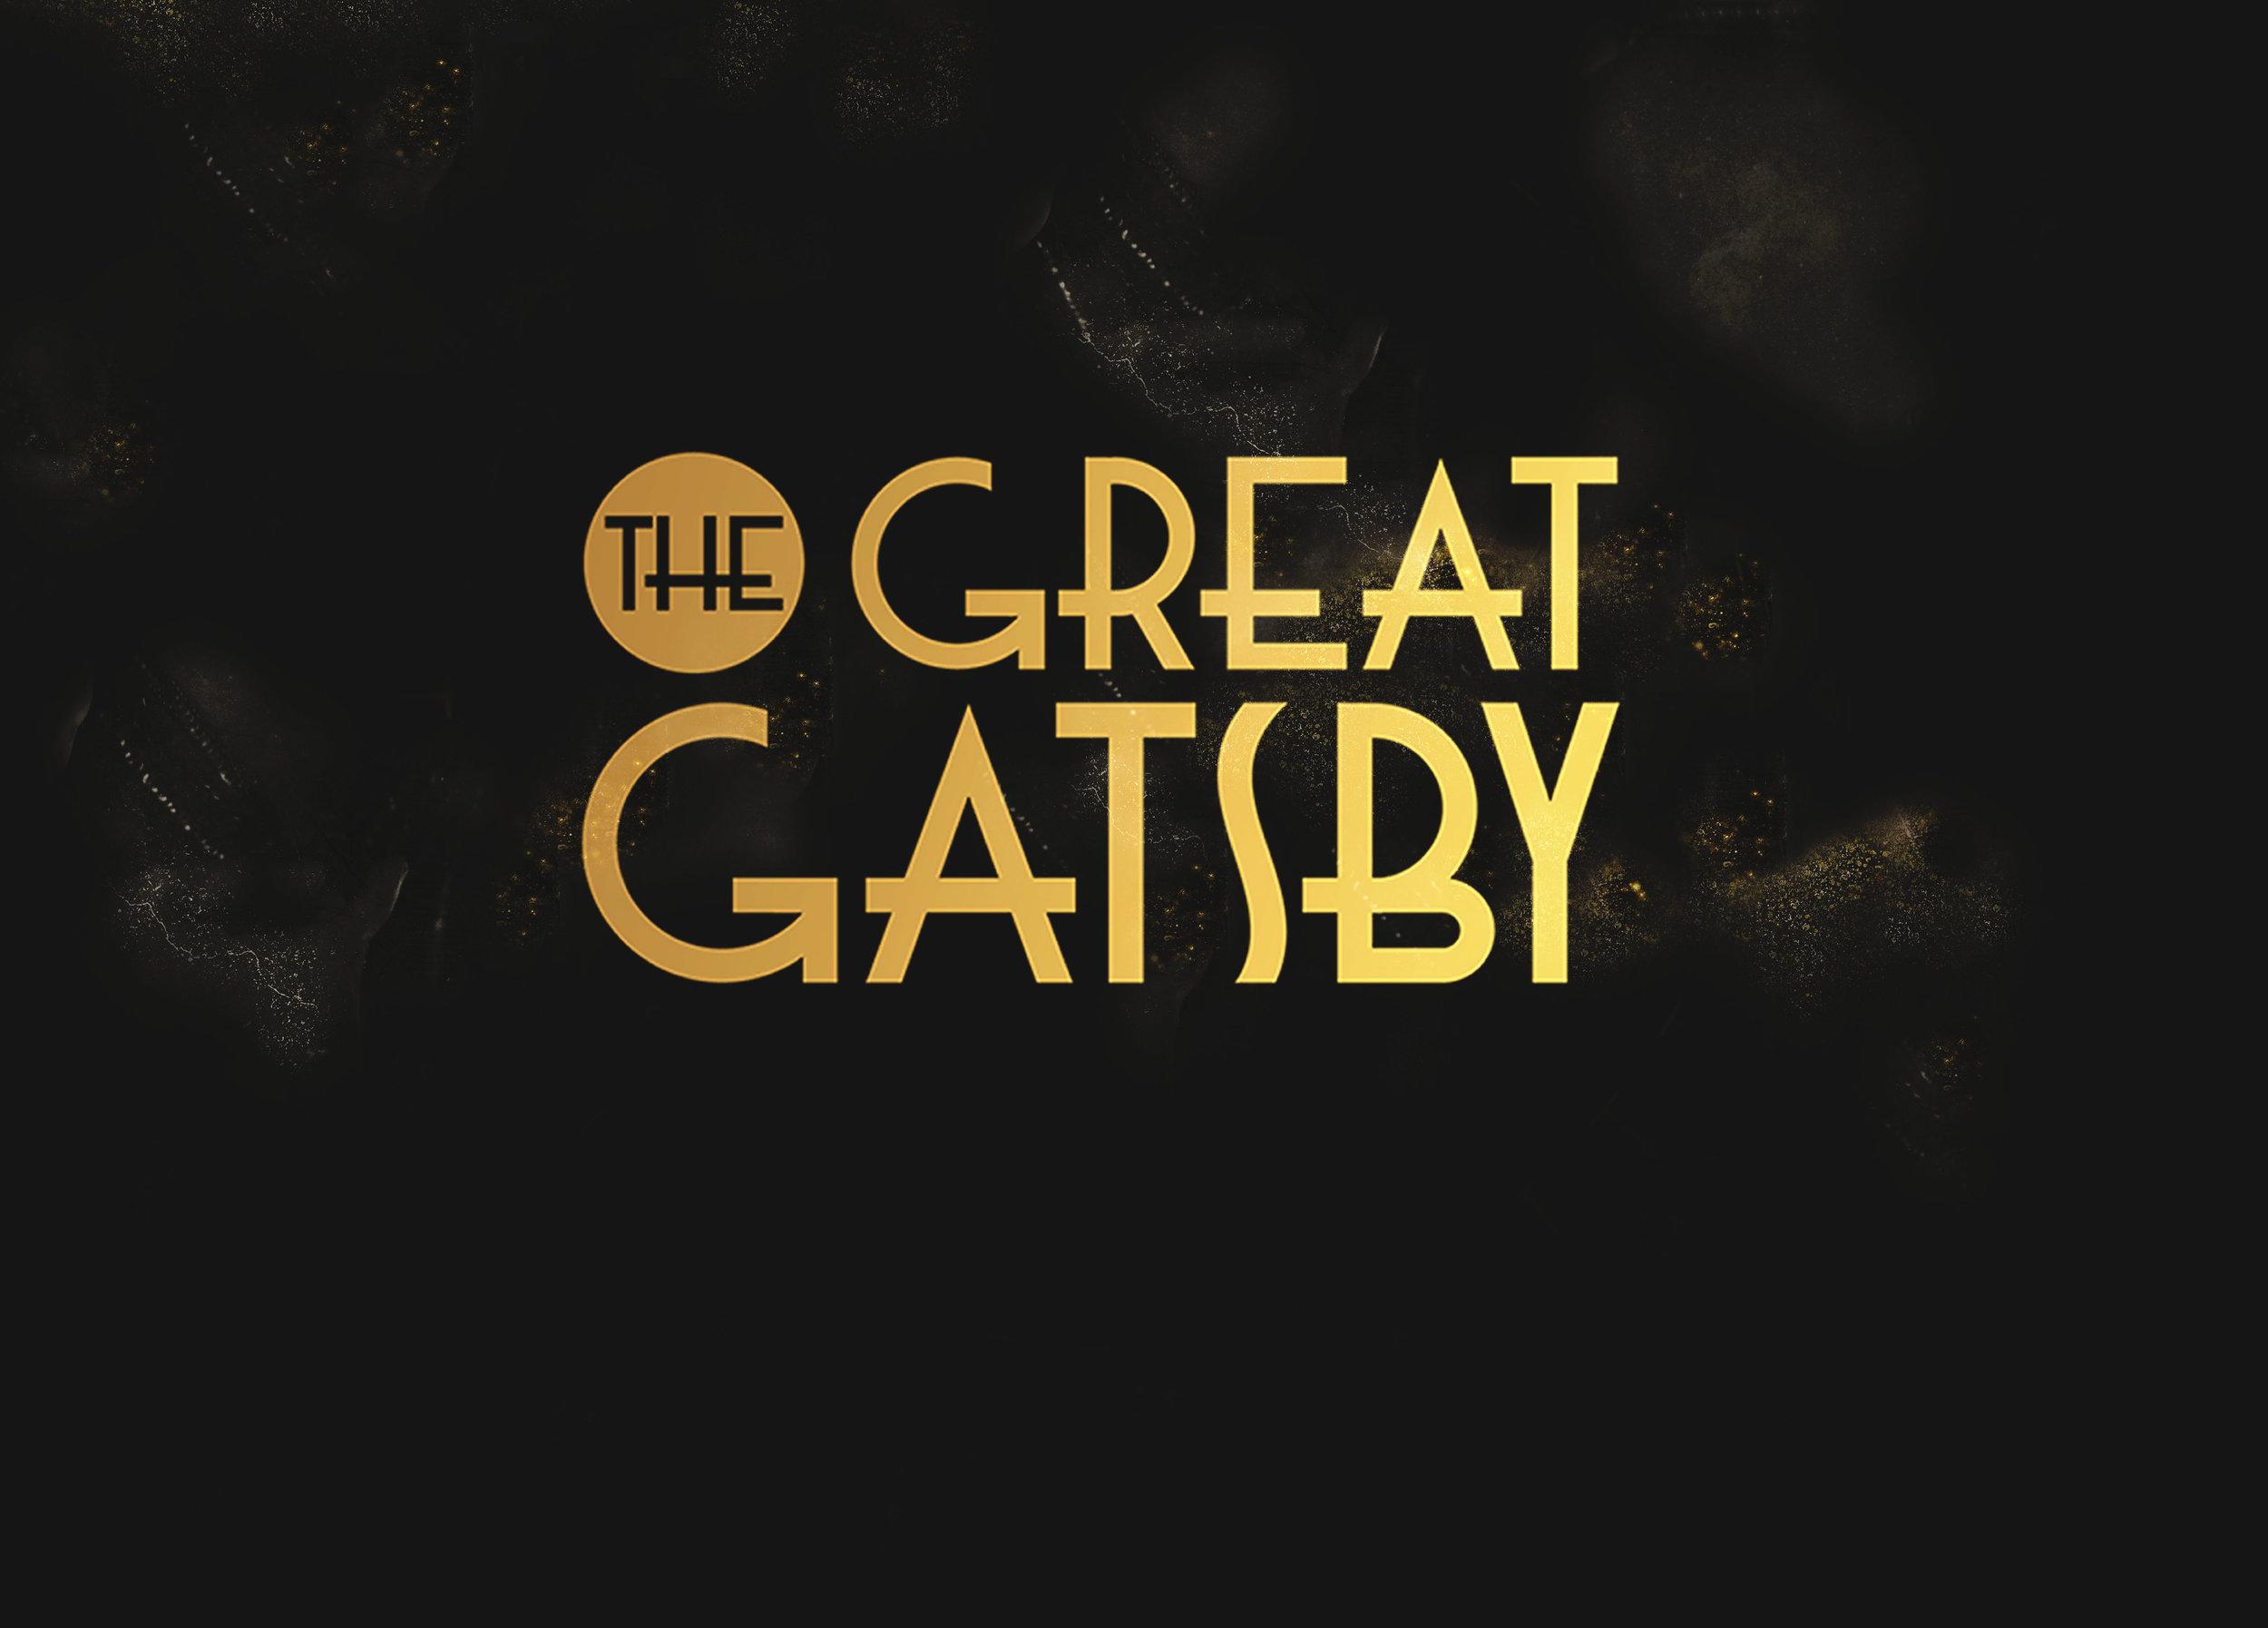 Gatsby_title.jpg